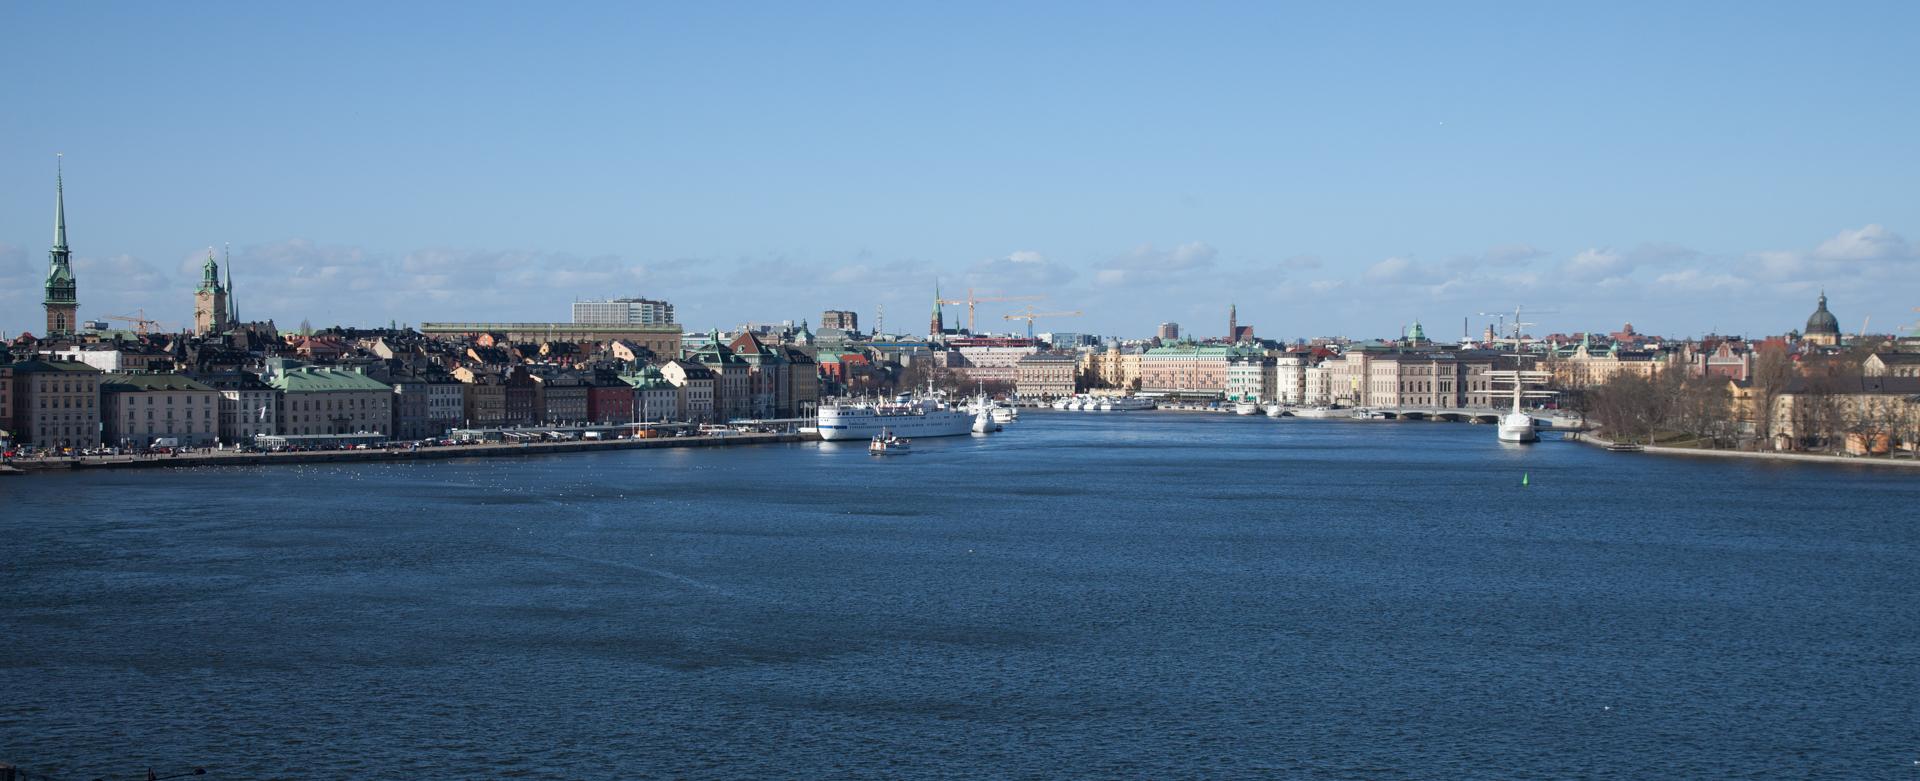 Stockholm -61.jpg